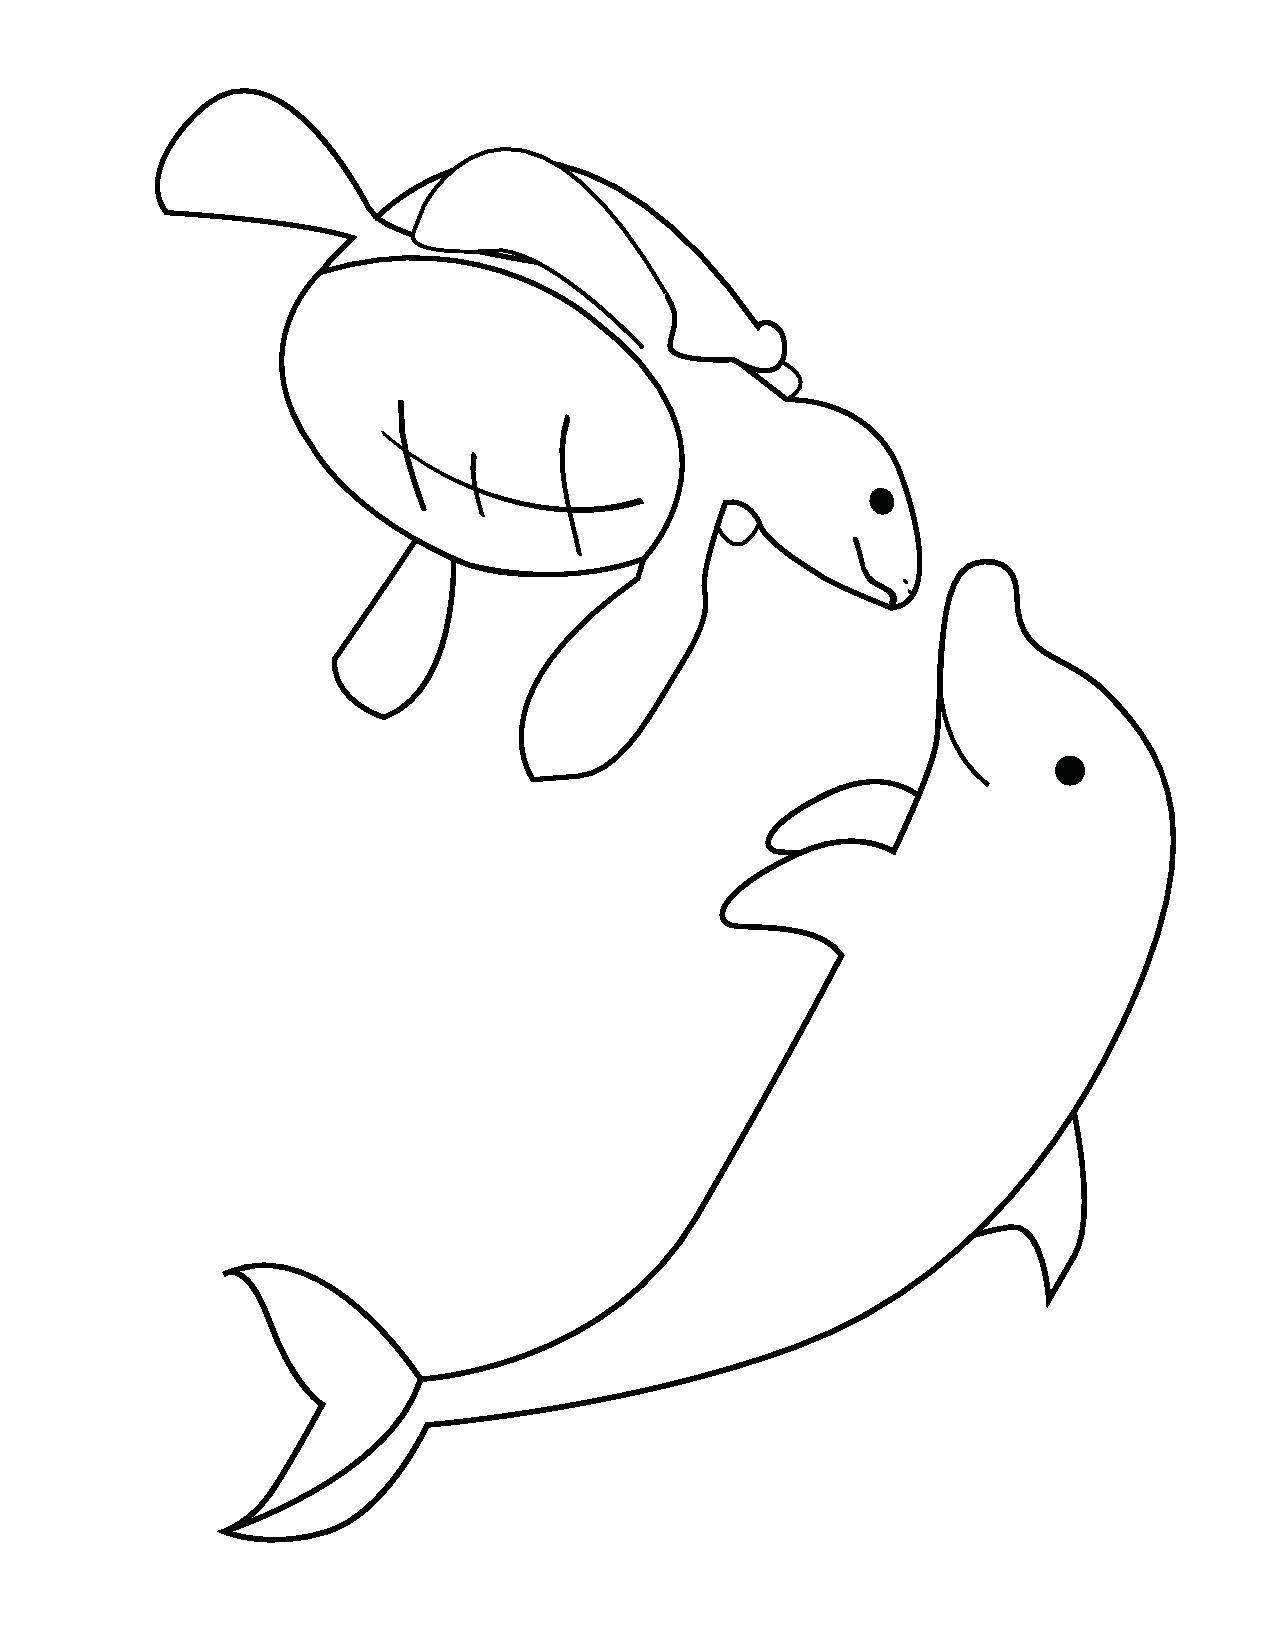 Bu Sayfamizda Okyanus Hayvanlari Calismalari Yer Almaktadir